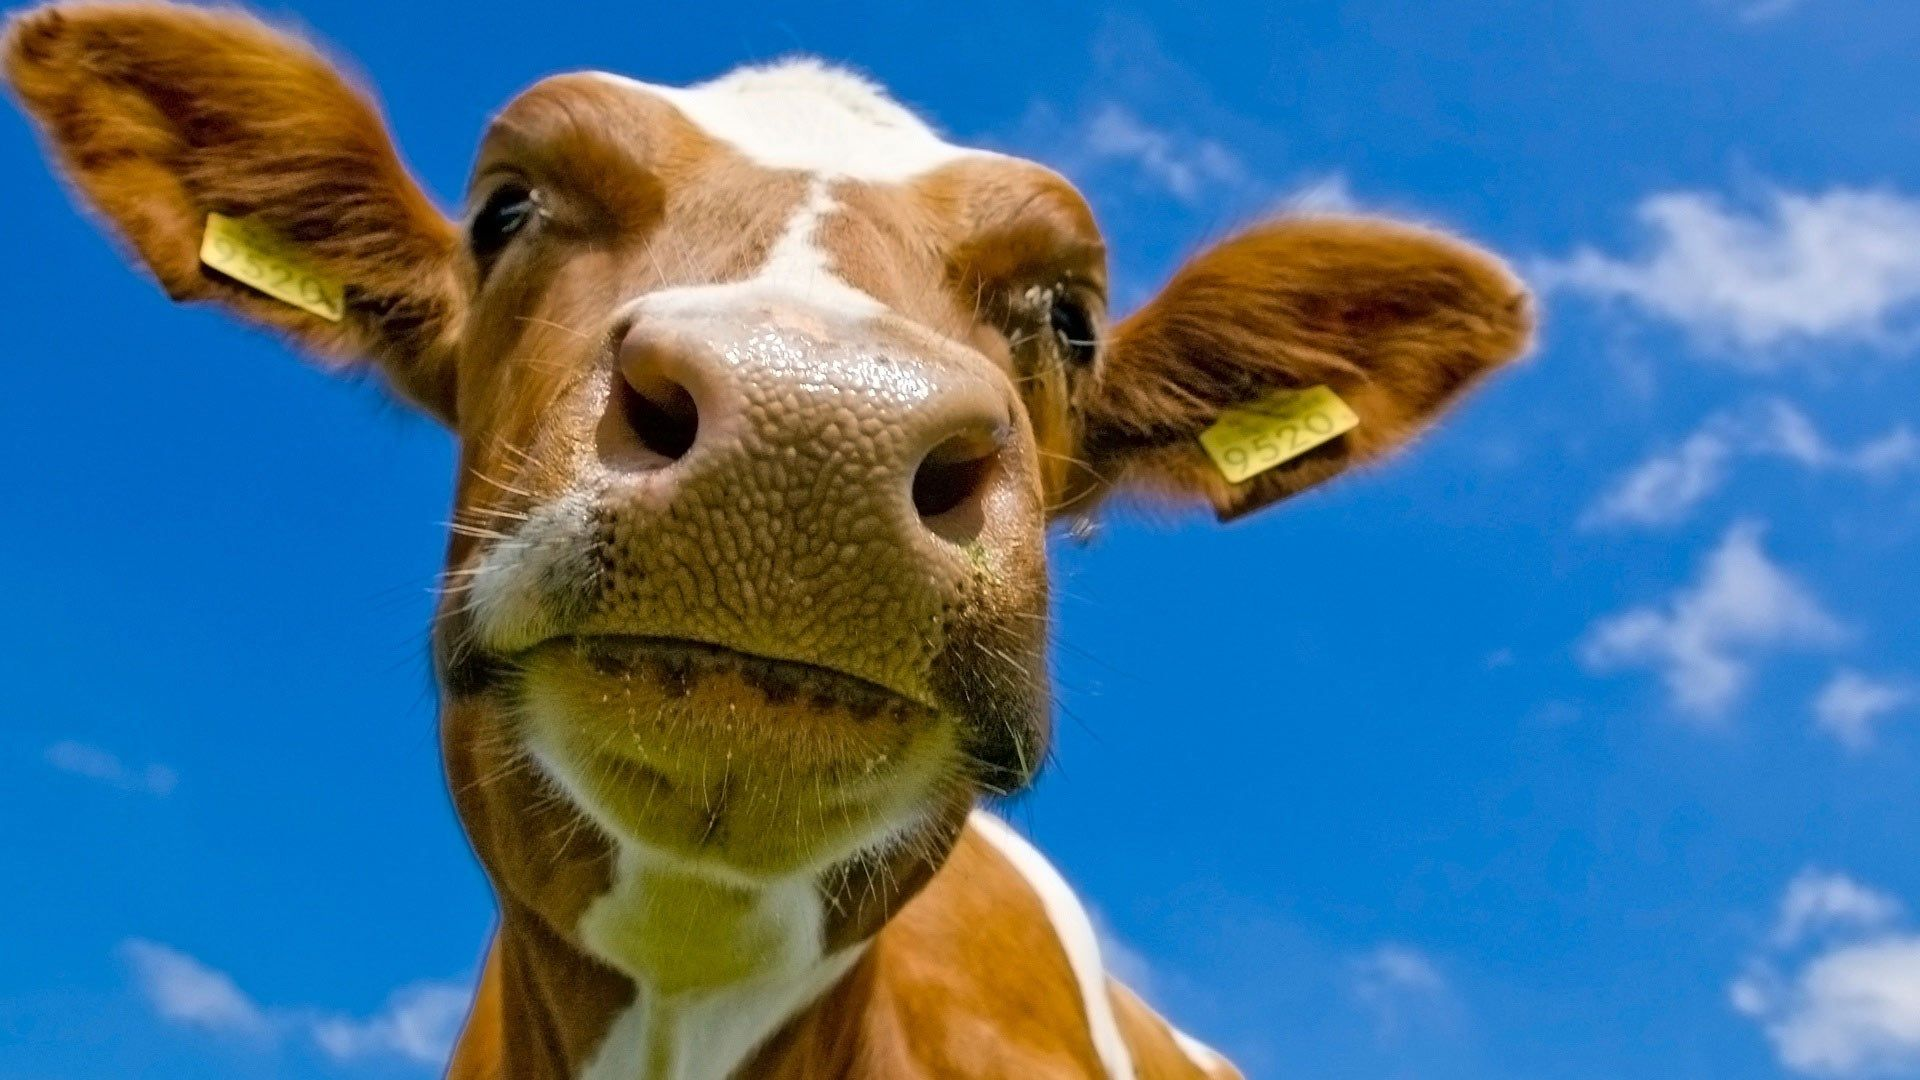 Best Desktop Wallpaper To Download Hd Cow 1920x1080 1 Cute Cows Cow Wallpaper Cows Funny